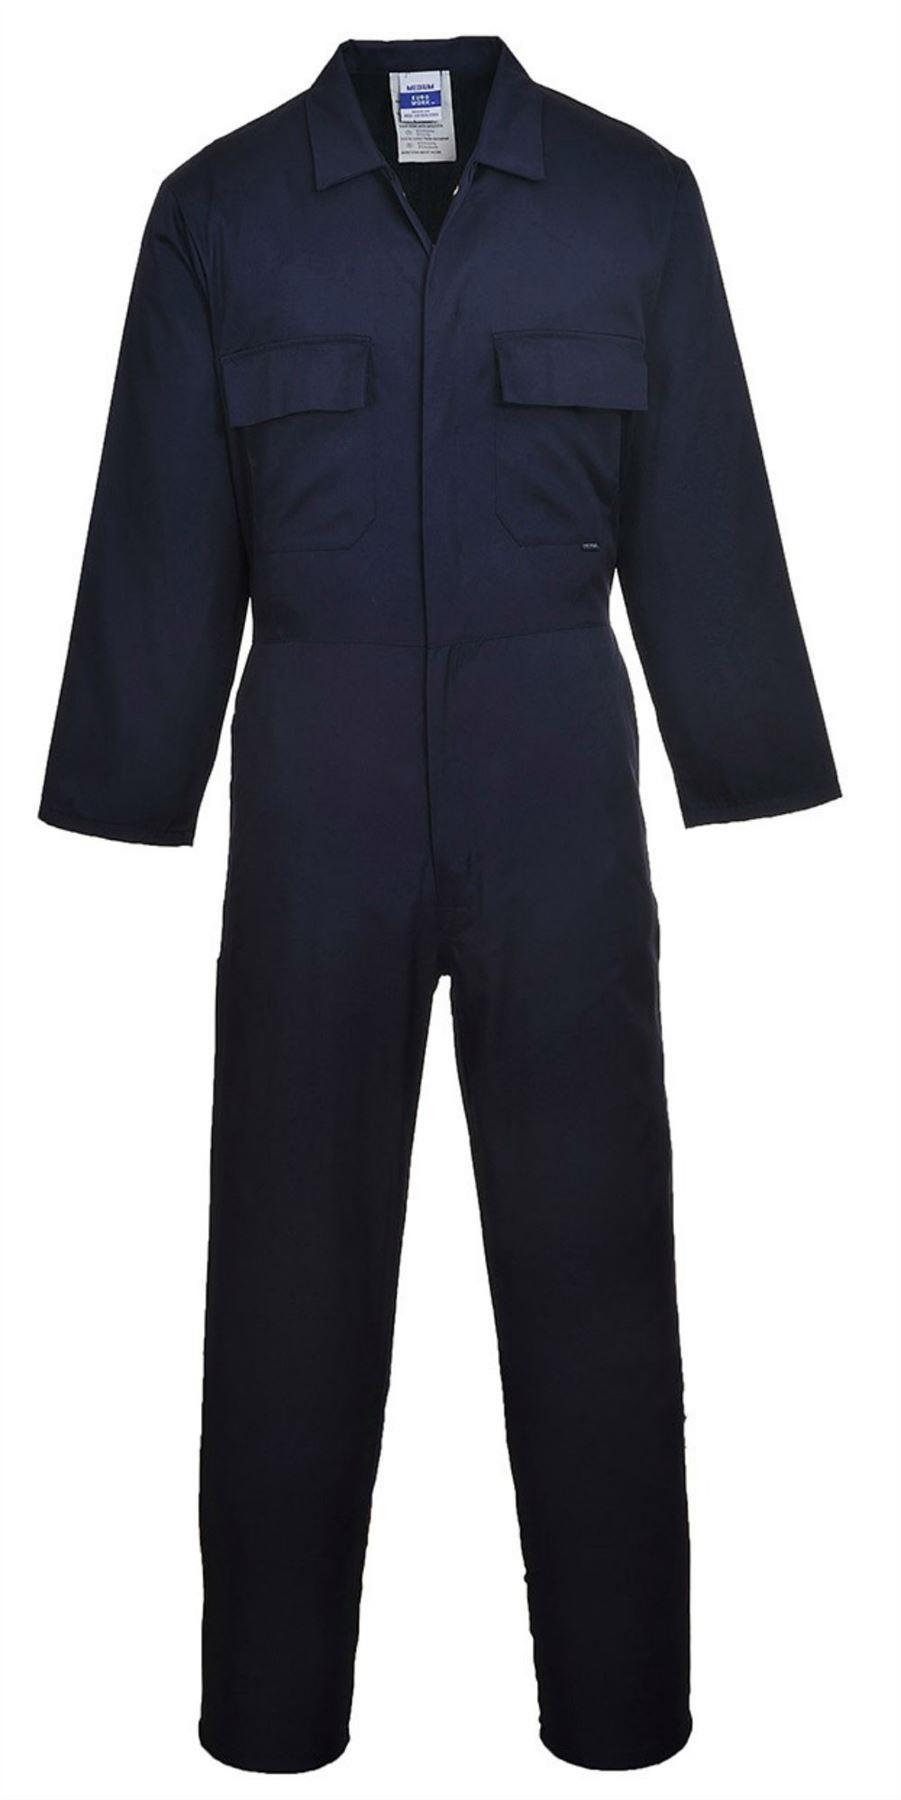 Portwest Standard Workwear Overalls - Navy 4XL